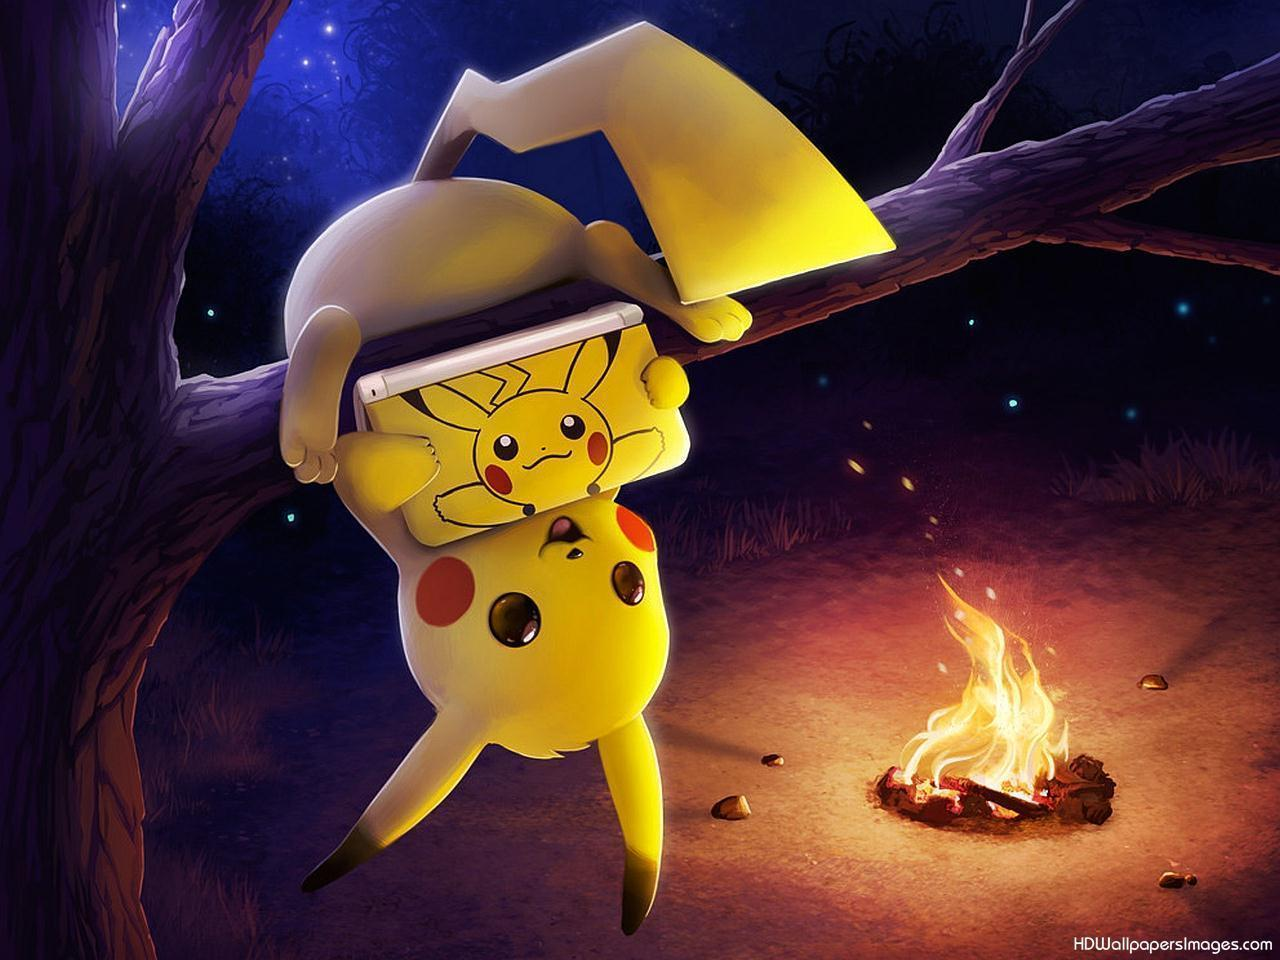 anime pokemon wallpapers hd - photo #19